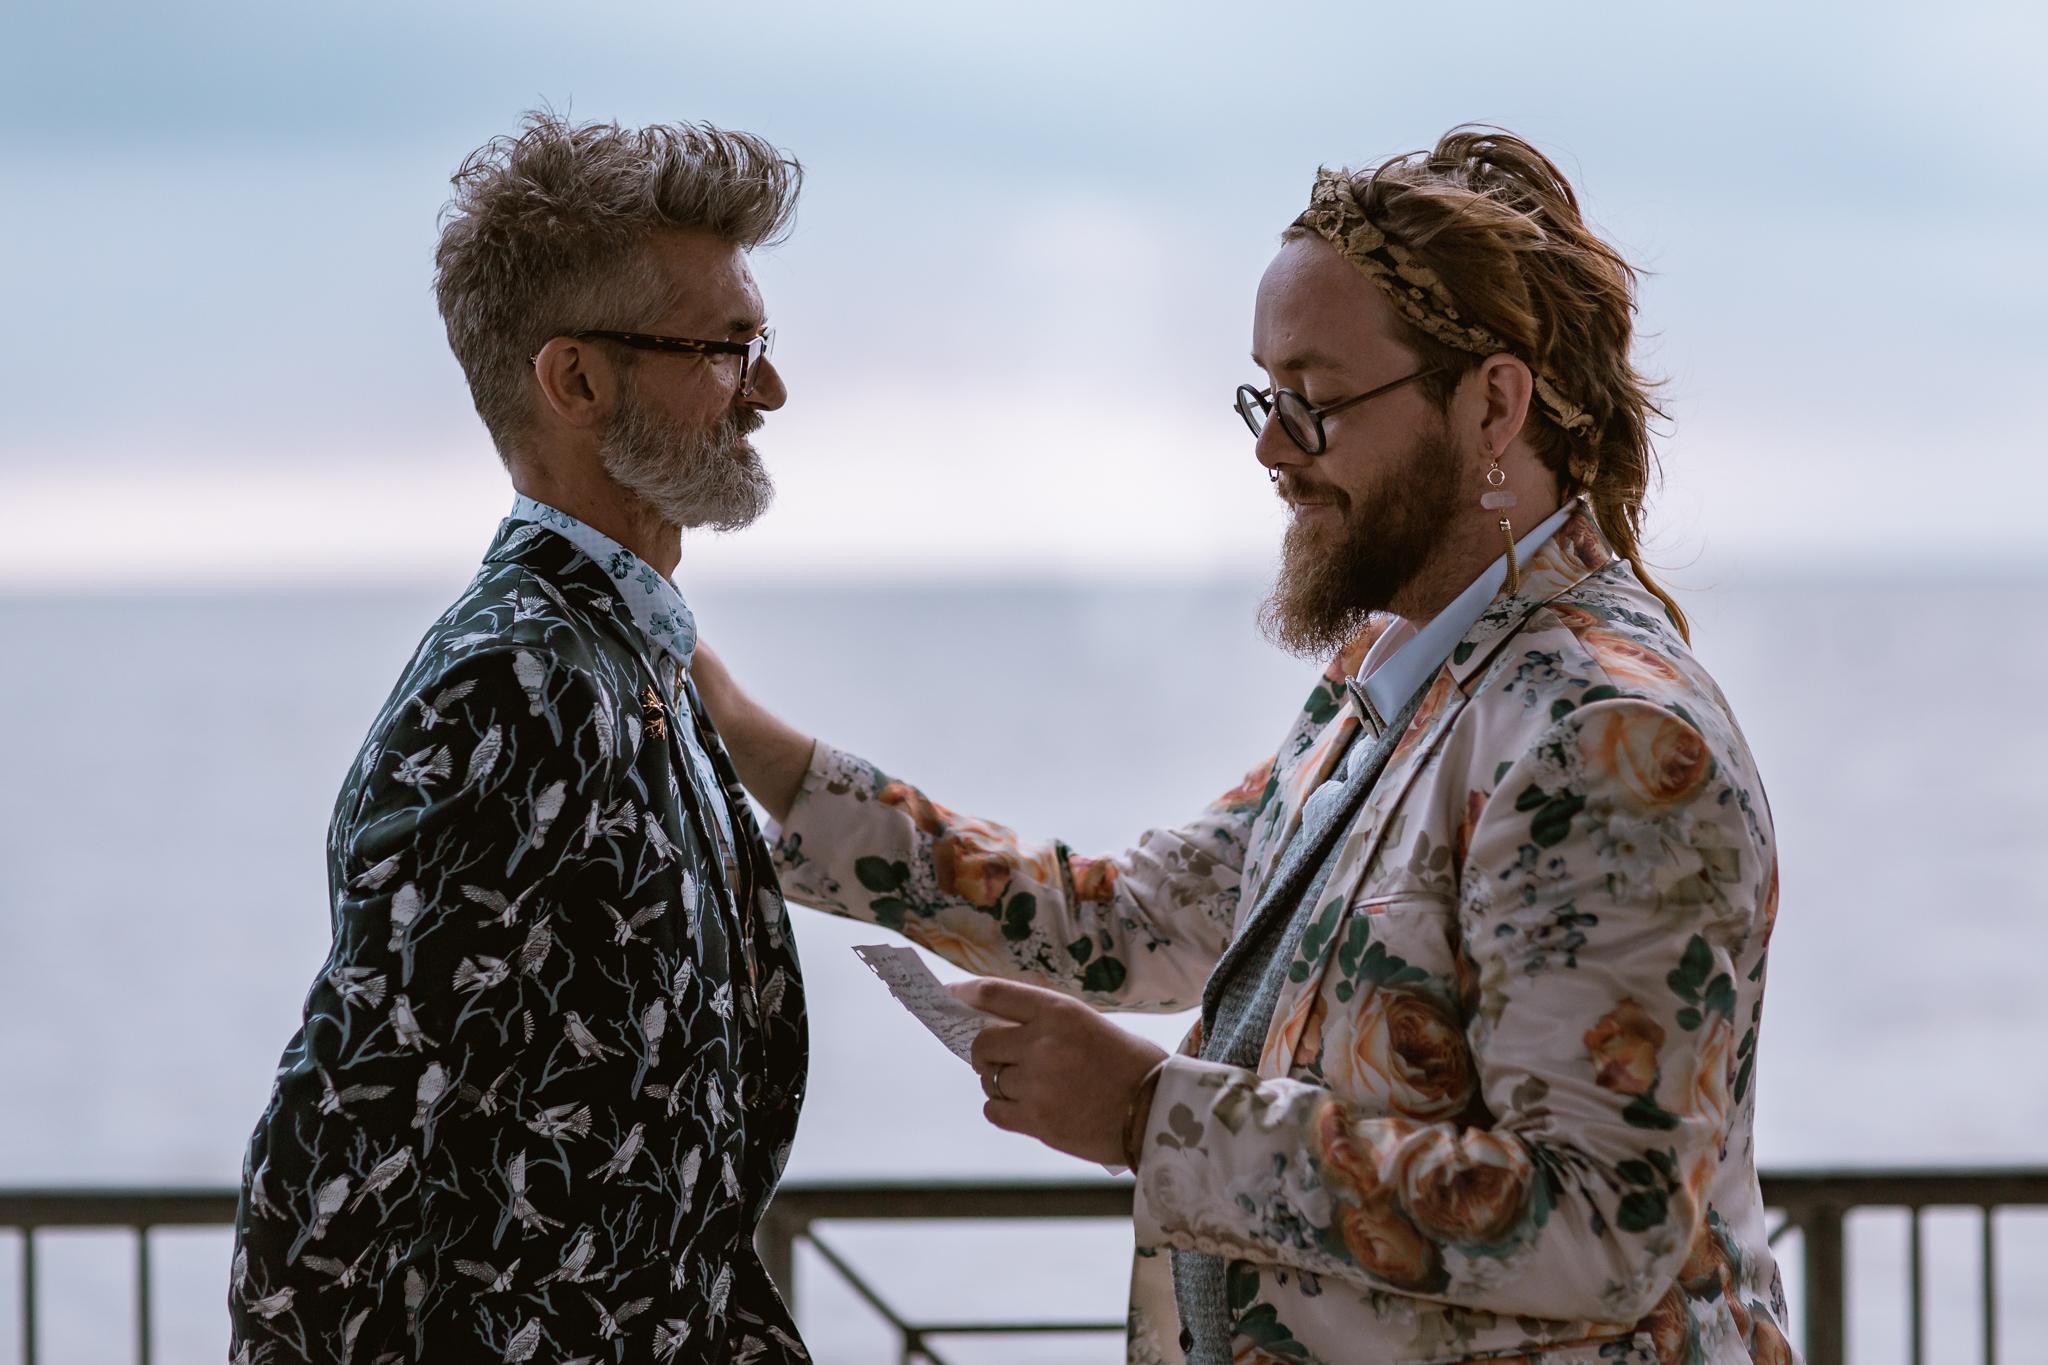 Tim and David - New orleans Wedding - Kallistia Photography-14.jpg